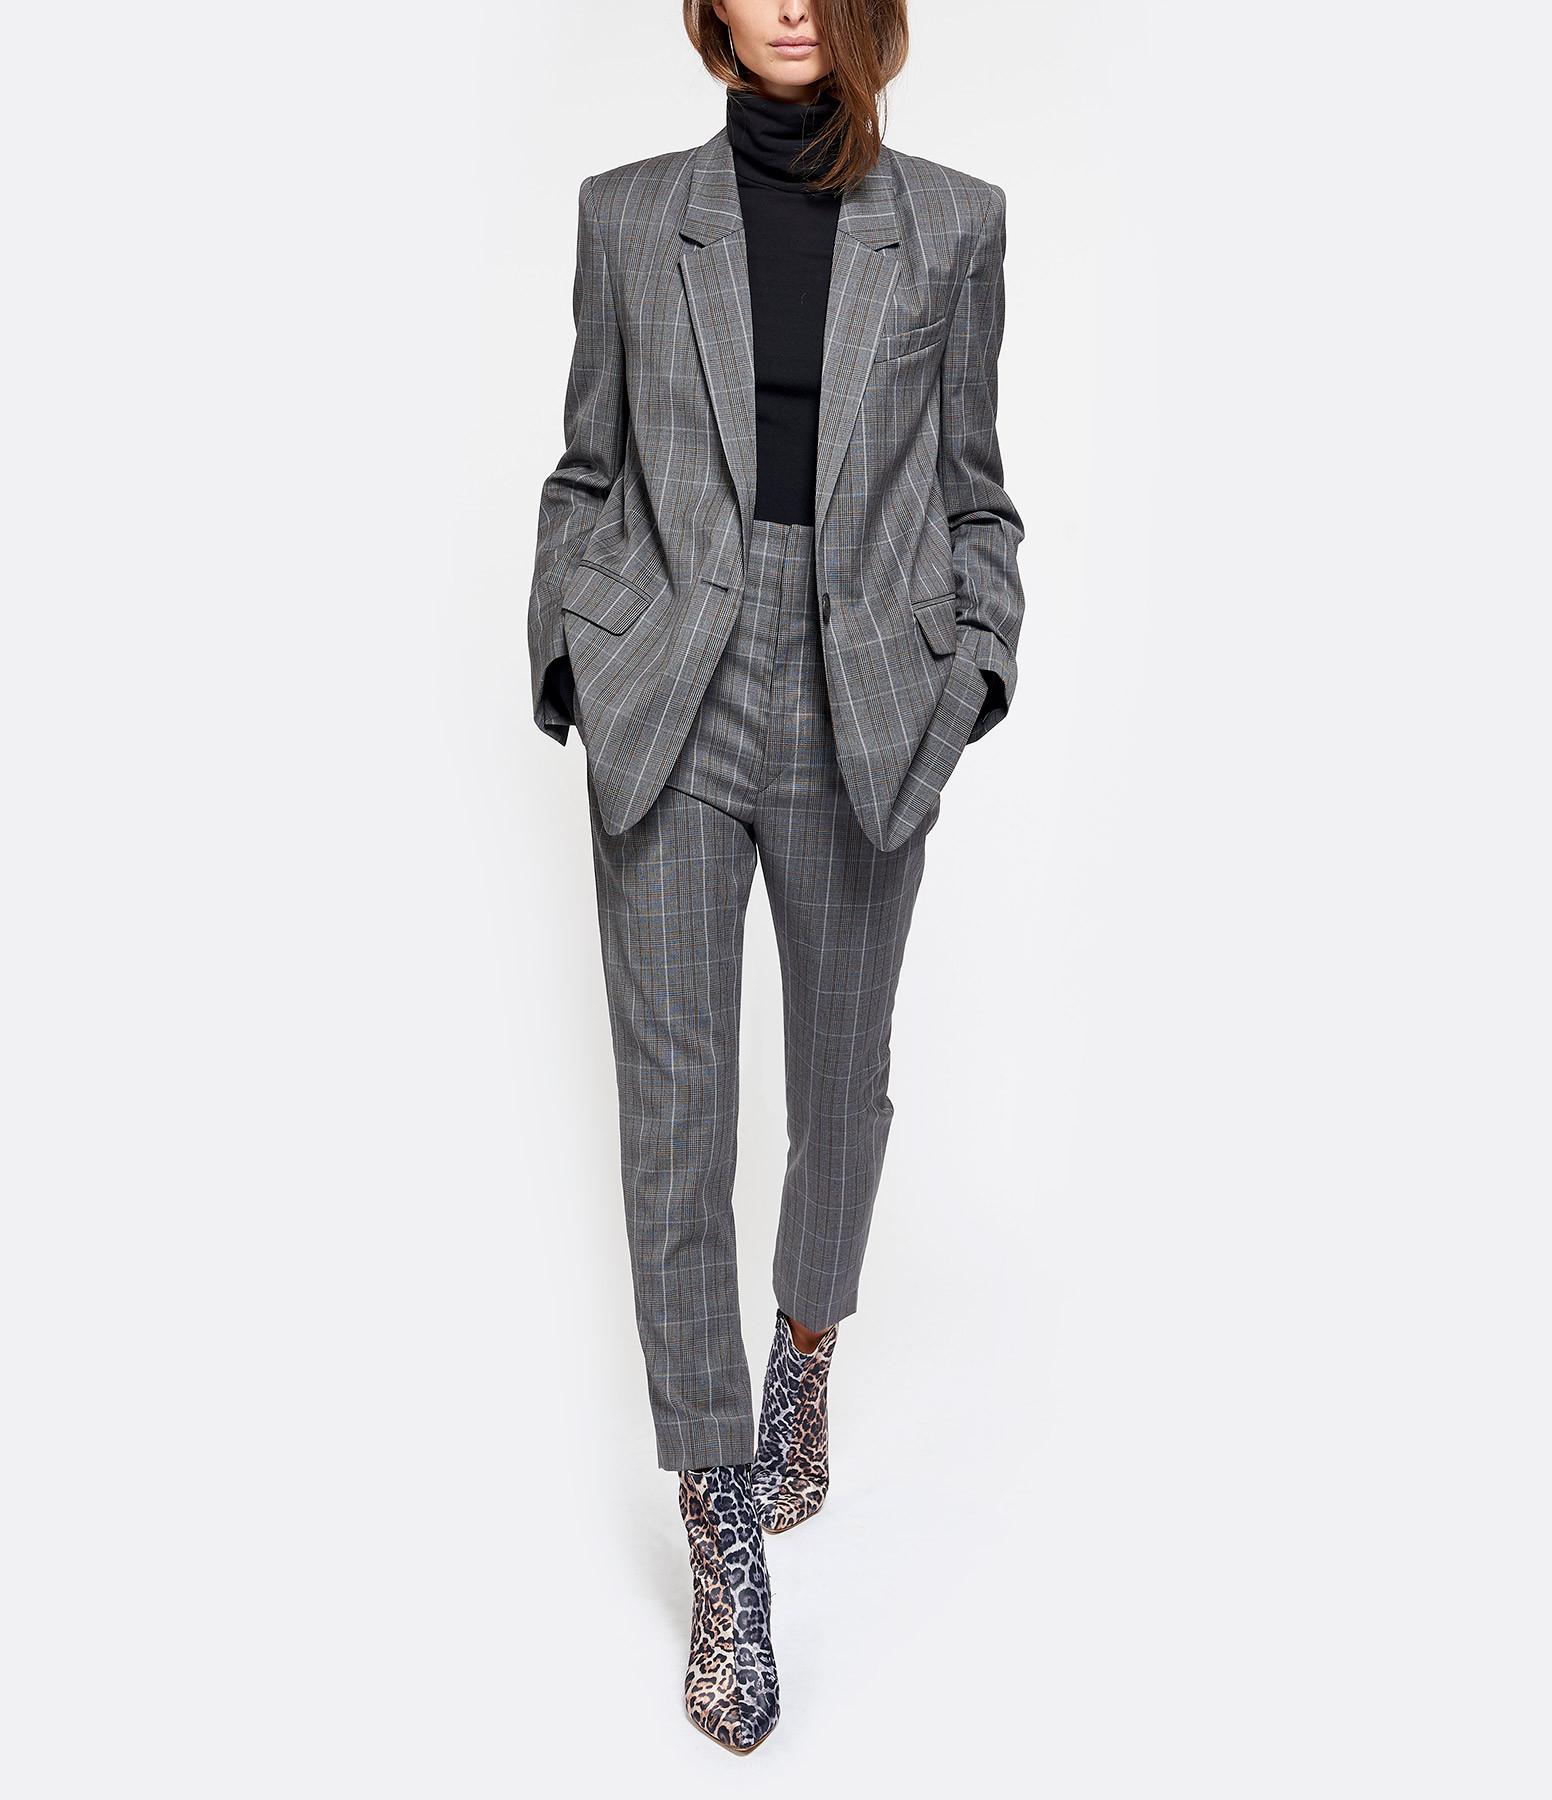 ISABEL MARANT ETOILE - Pantalon Noah Laine Gris